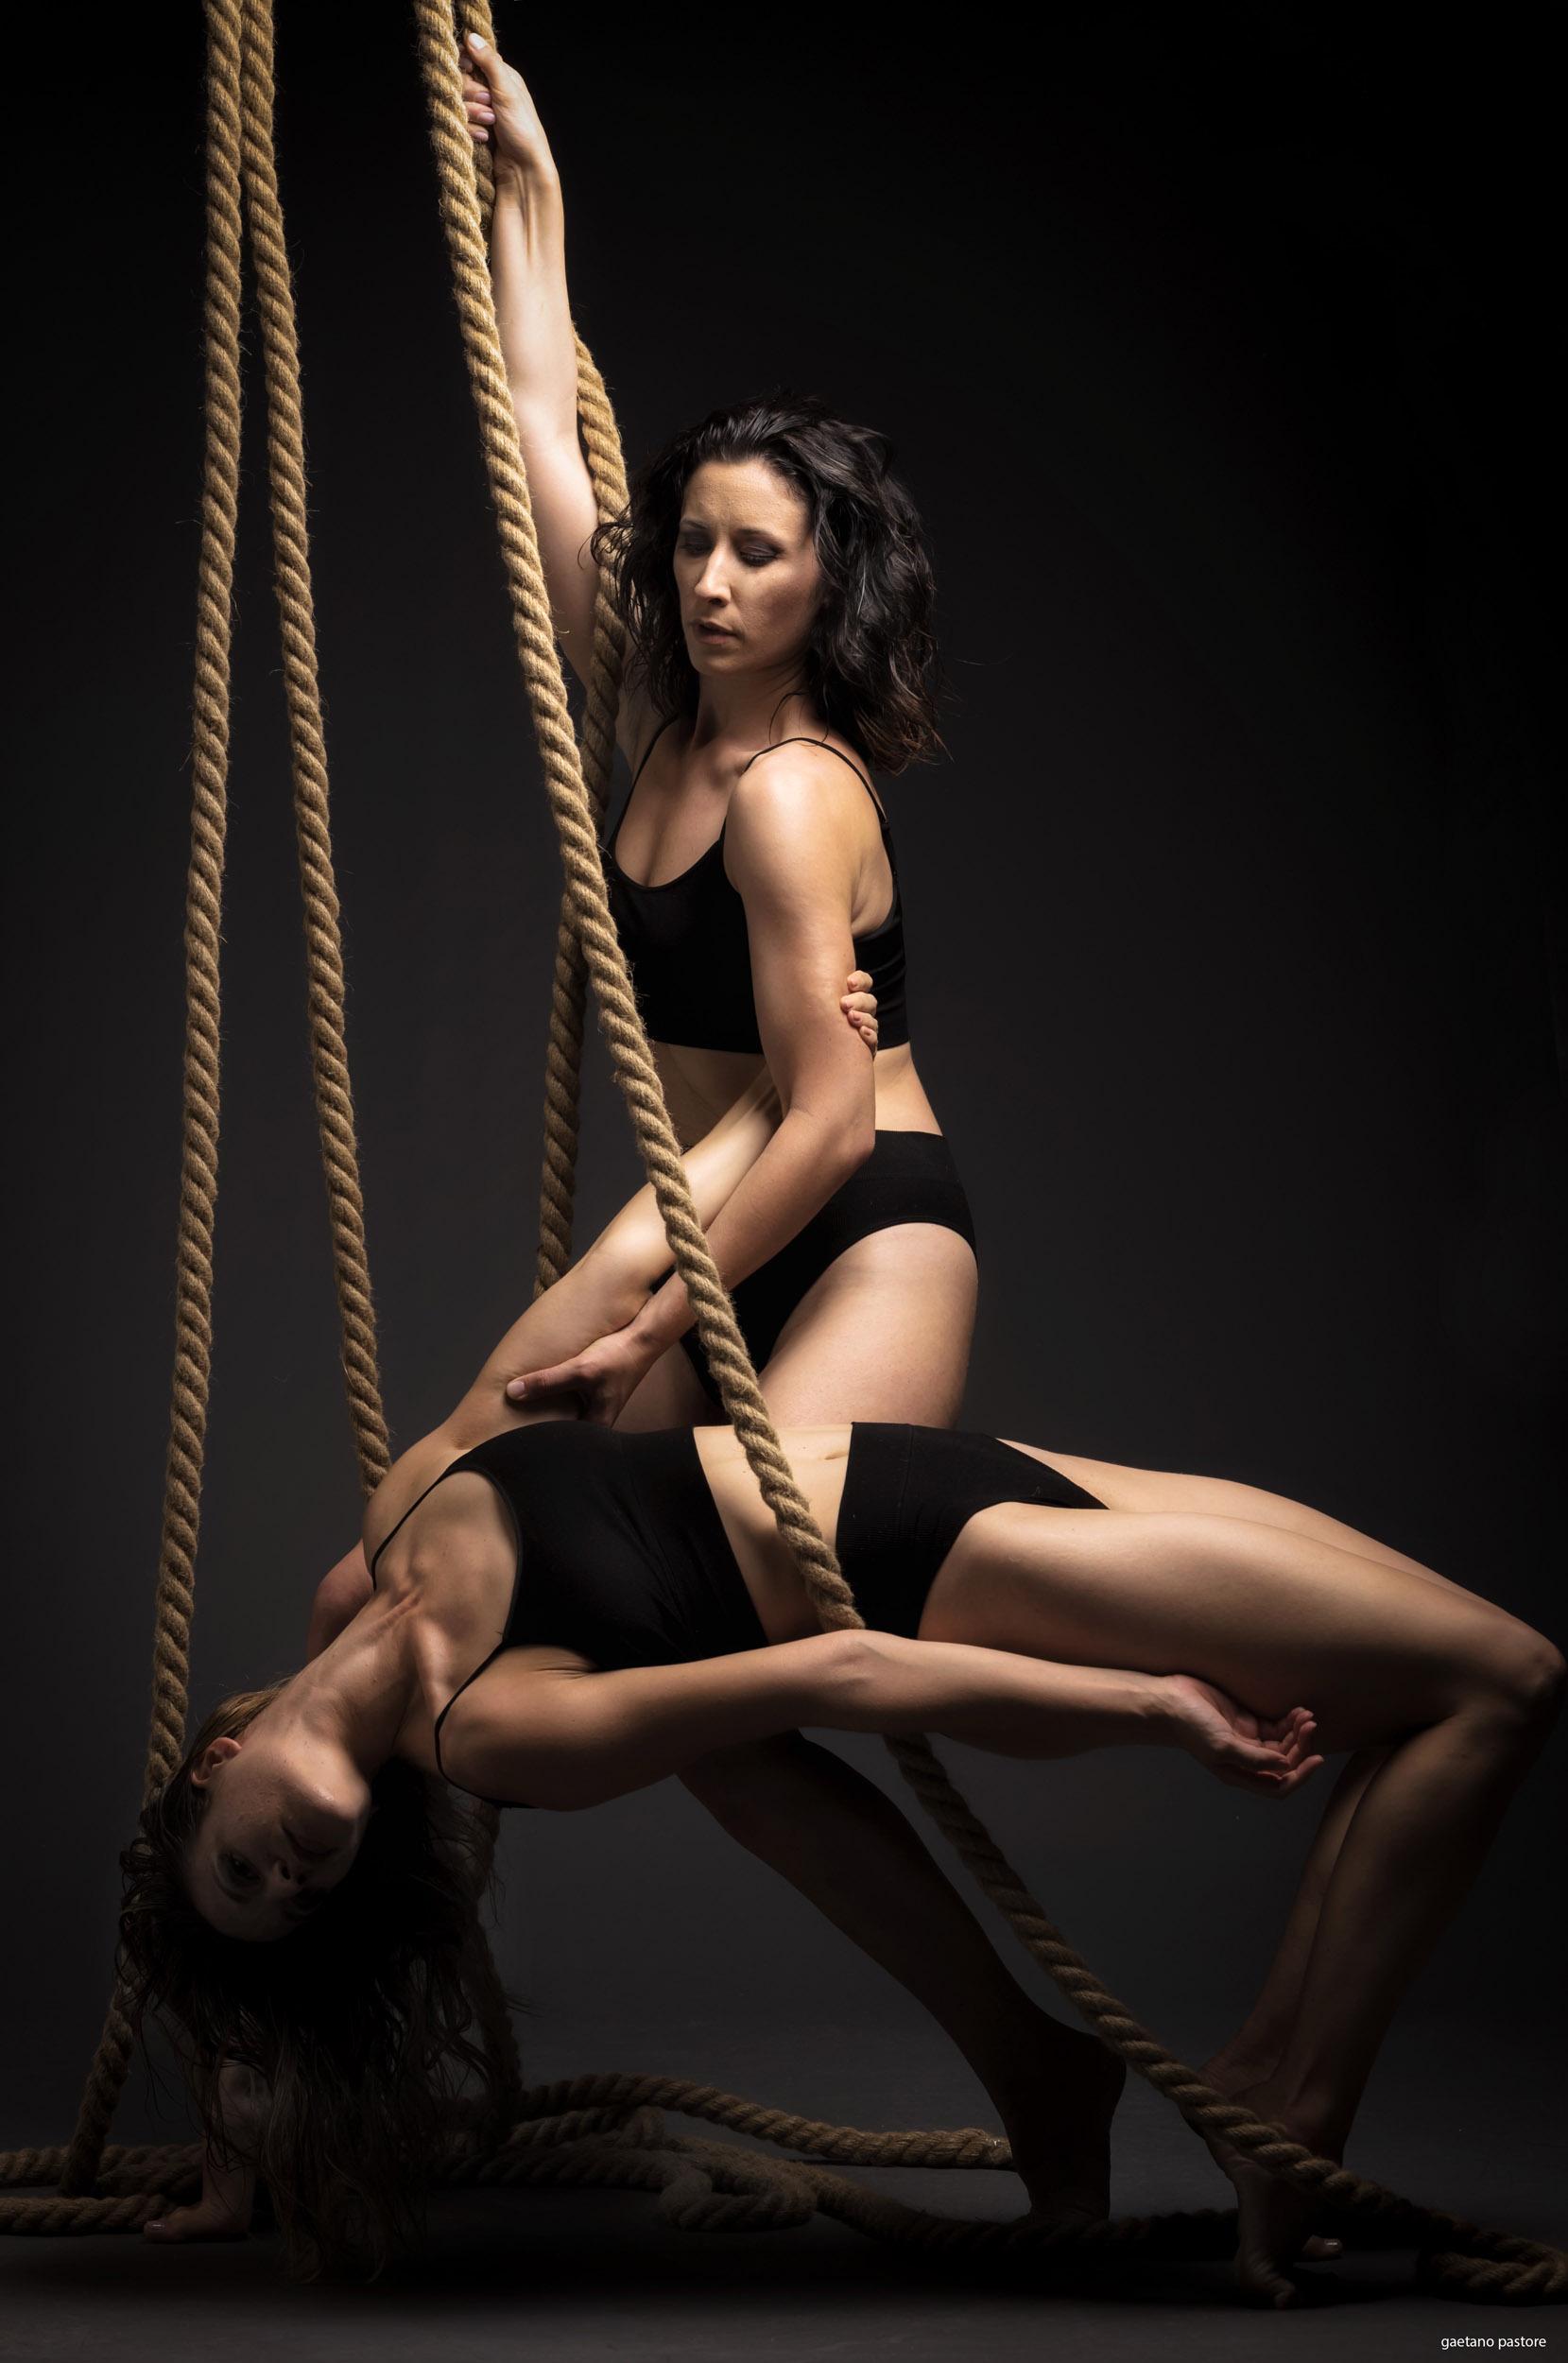 Categorie: Glamour, Portrait - Photographer: GAETANO PASTORE - Model & Dancer: ANGELA CAPUTO, MARTINA CARIELLO- Location: Roma